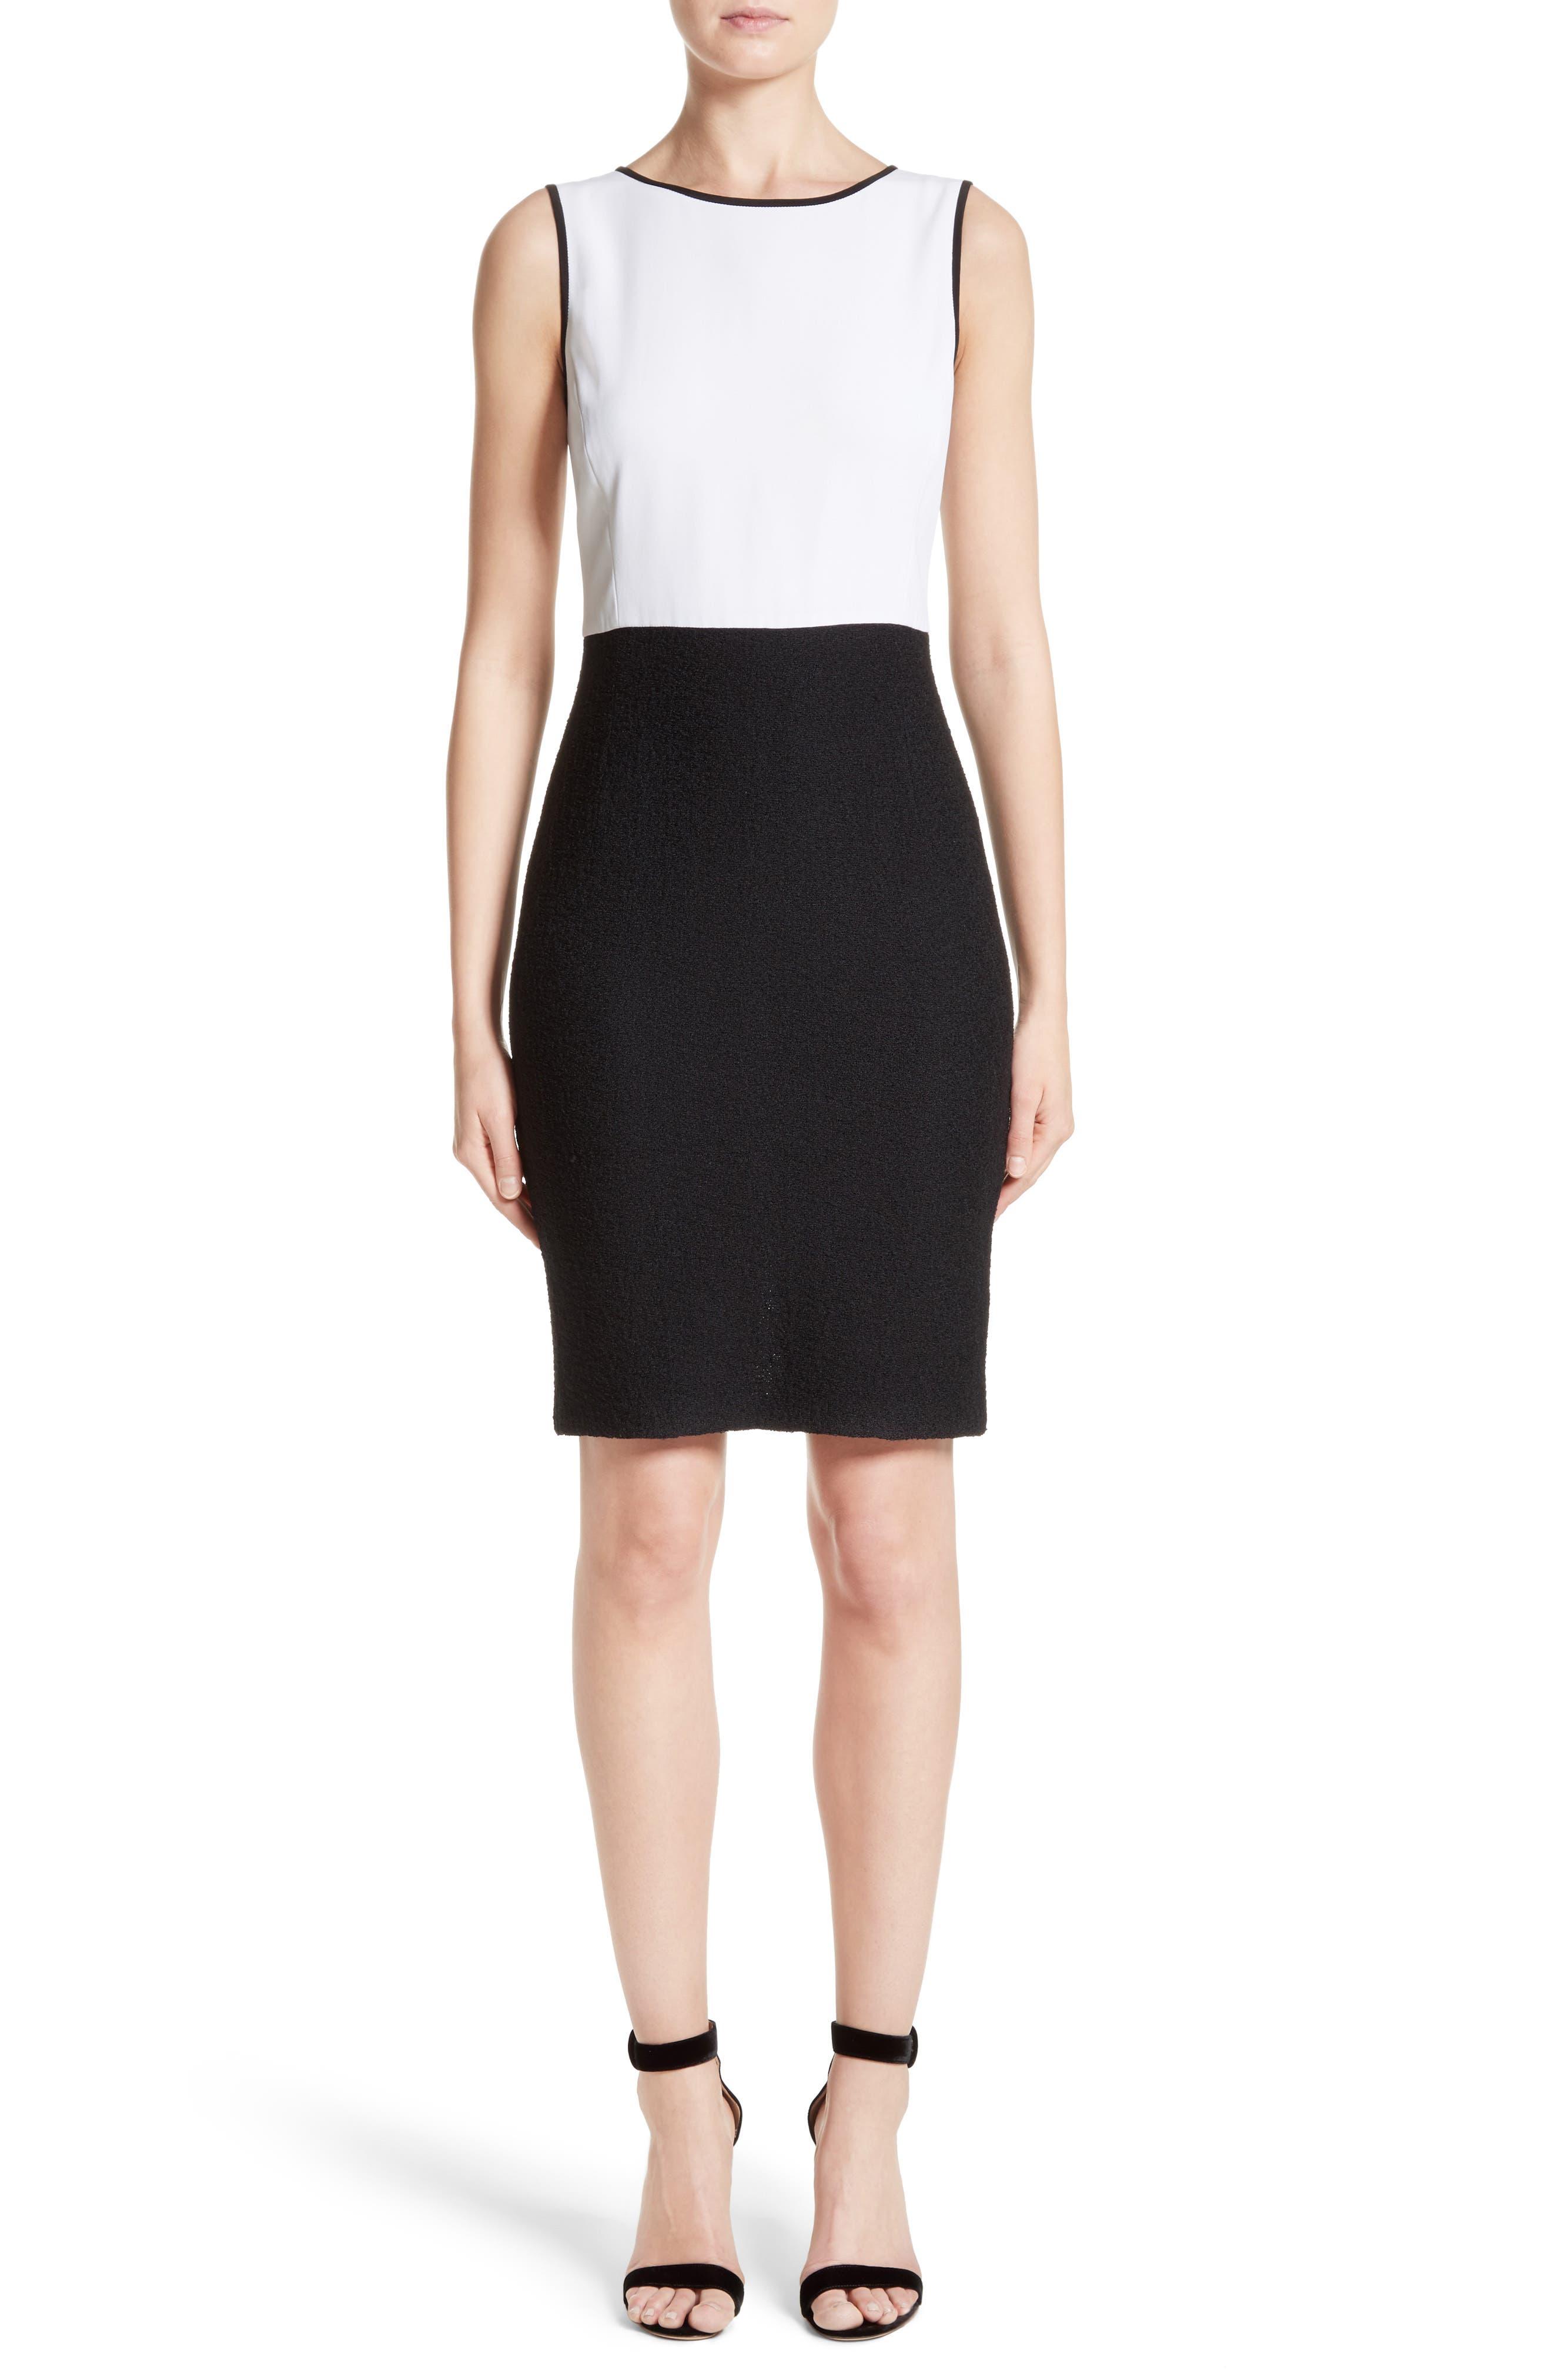 Cady Bodice Clair Knit Dress,                         Main,                         color, Bianco/ Caviar